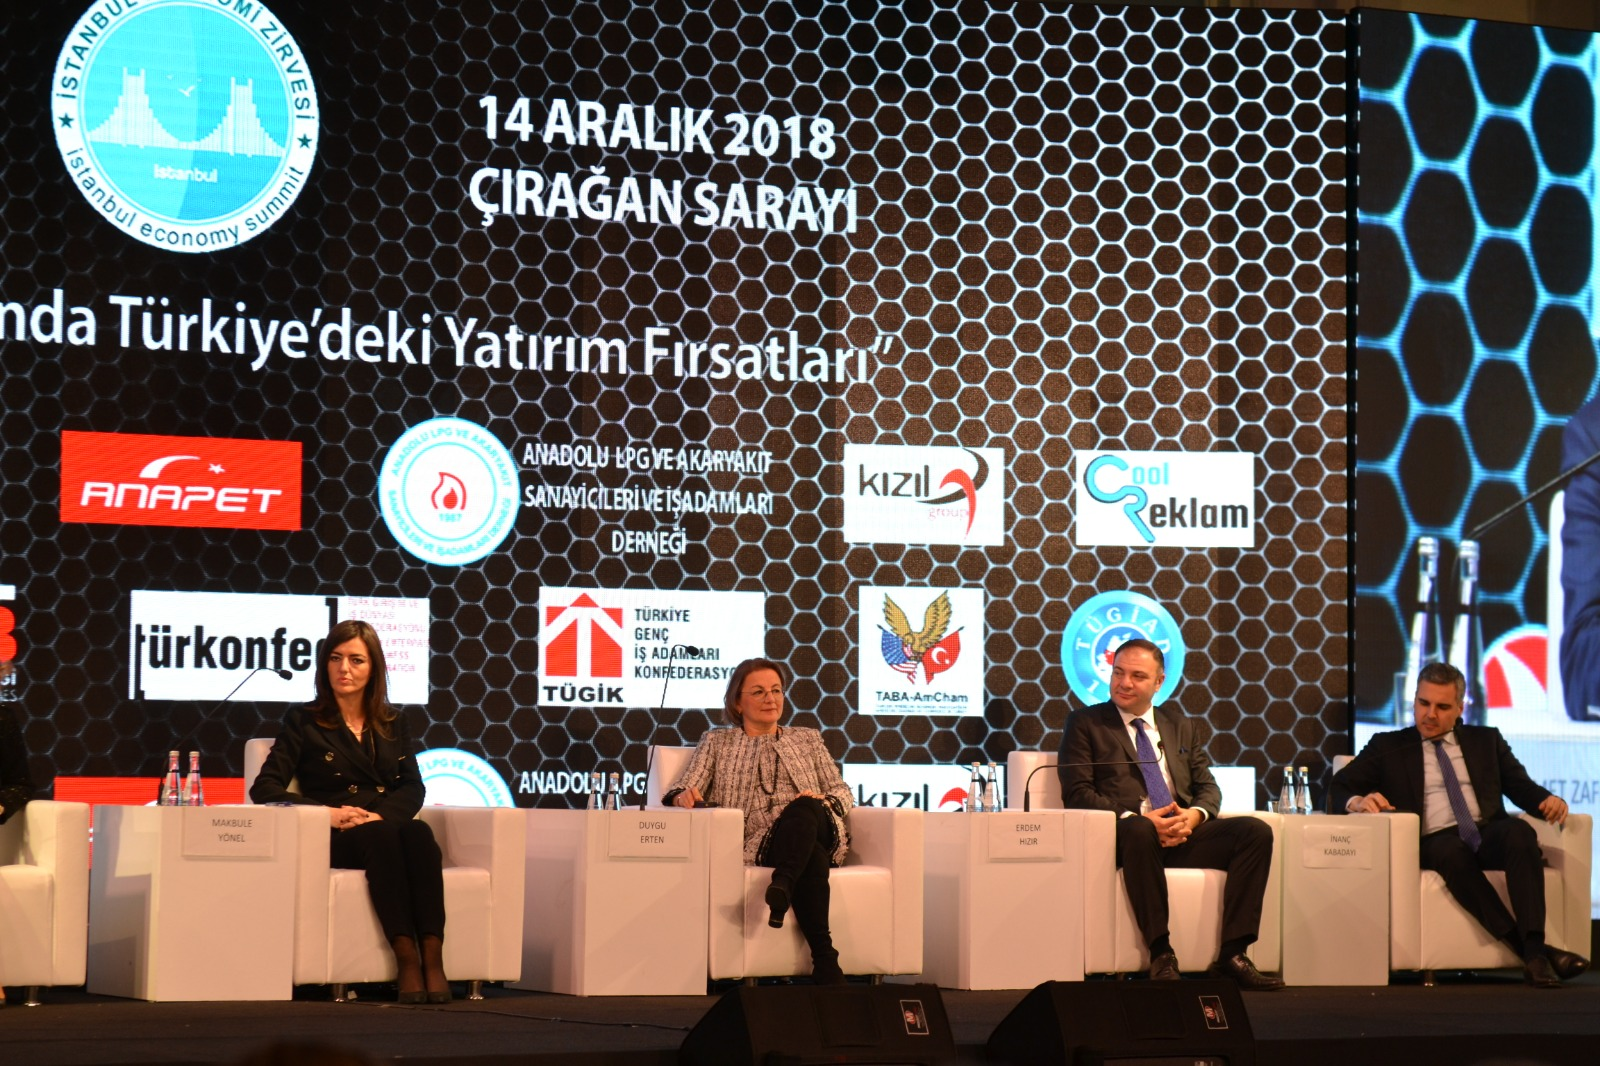 2. İstanbul Ekonomi Zirvesi